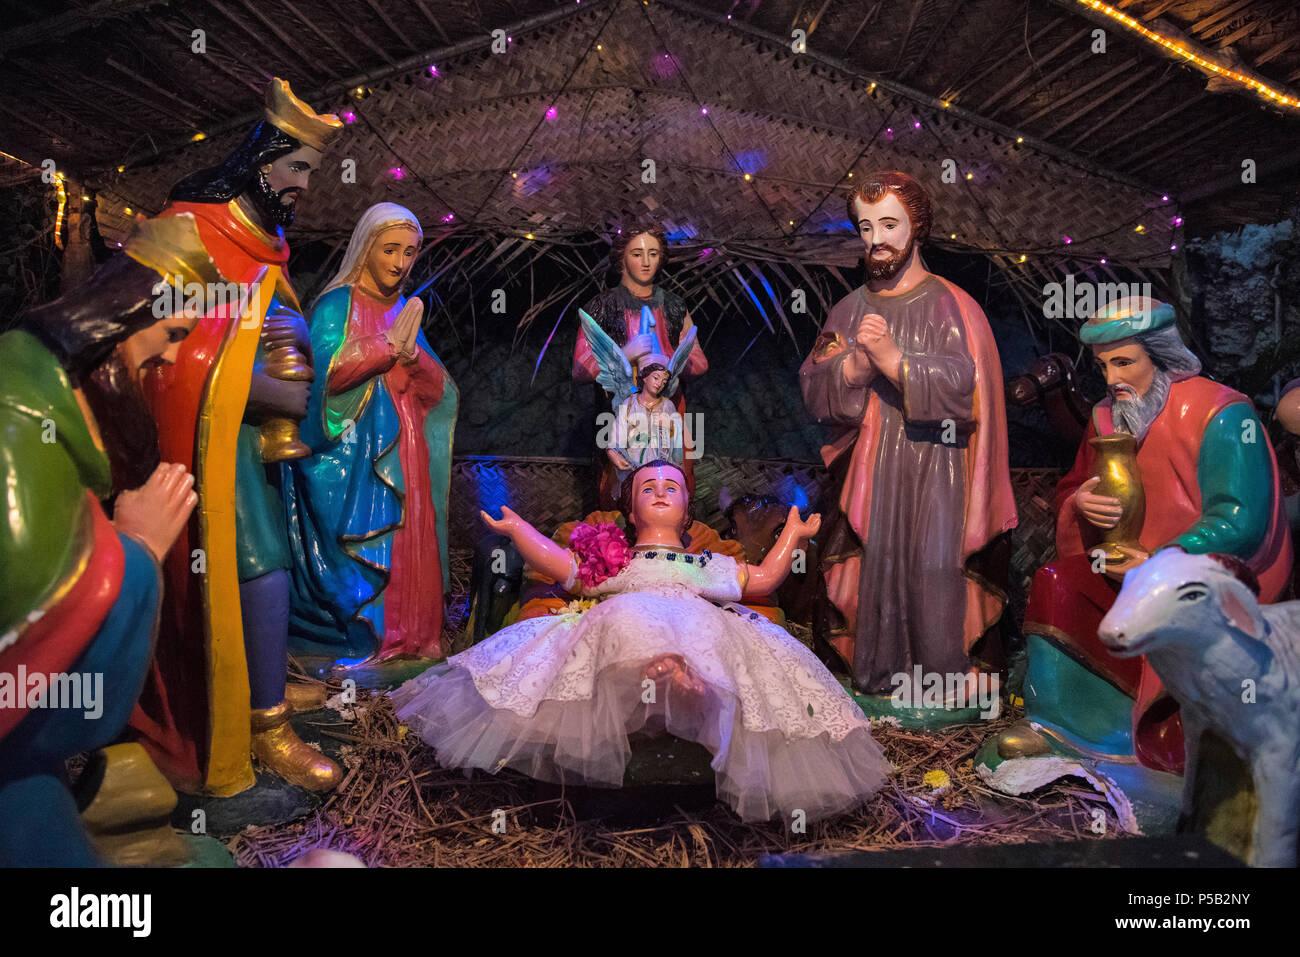 Nativity scene, Christmas at Basilica of the Sacred Heart of Jesus, Pondicherry, India - Stock Image